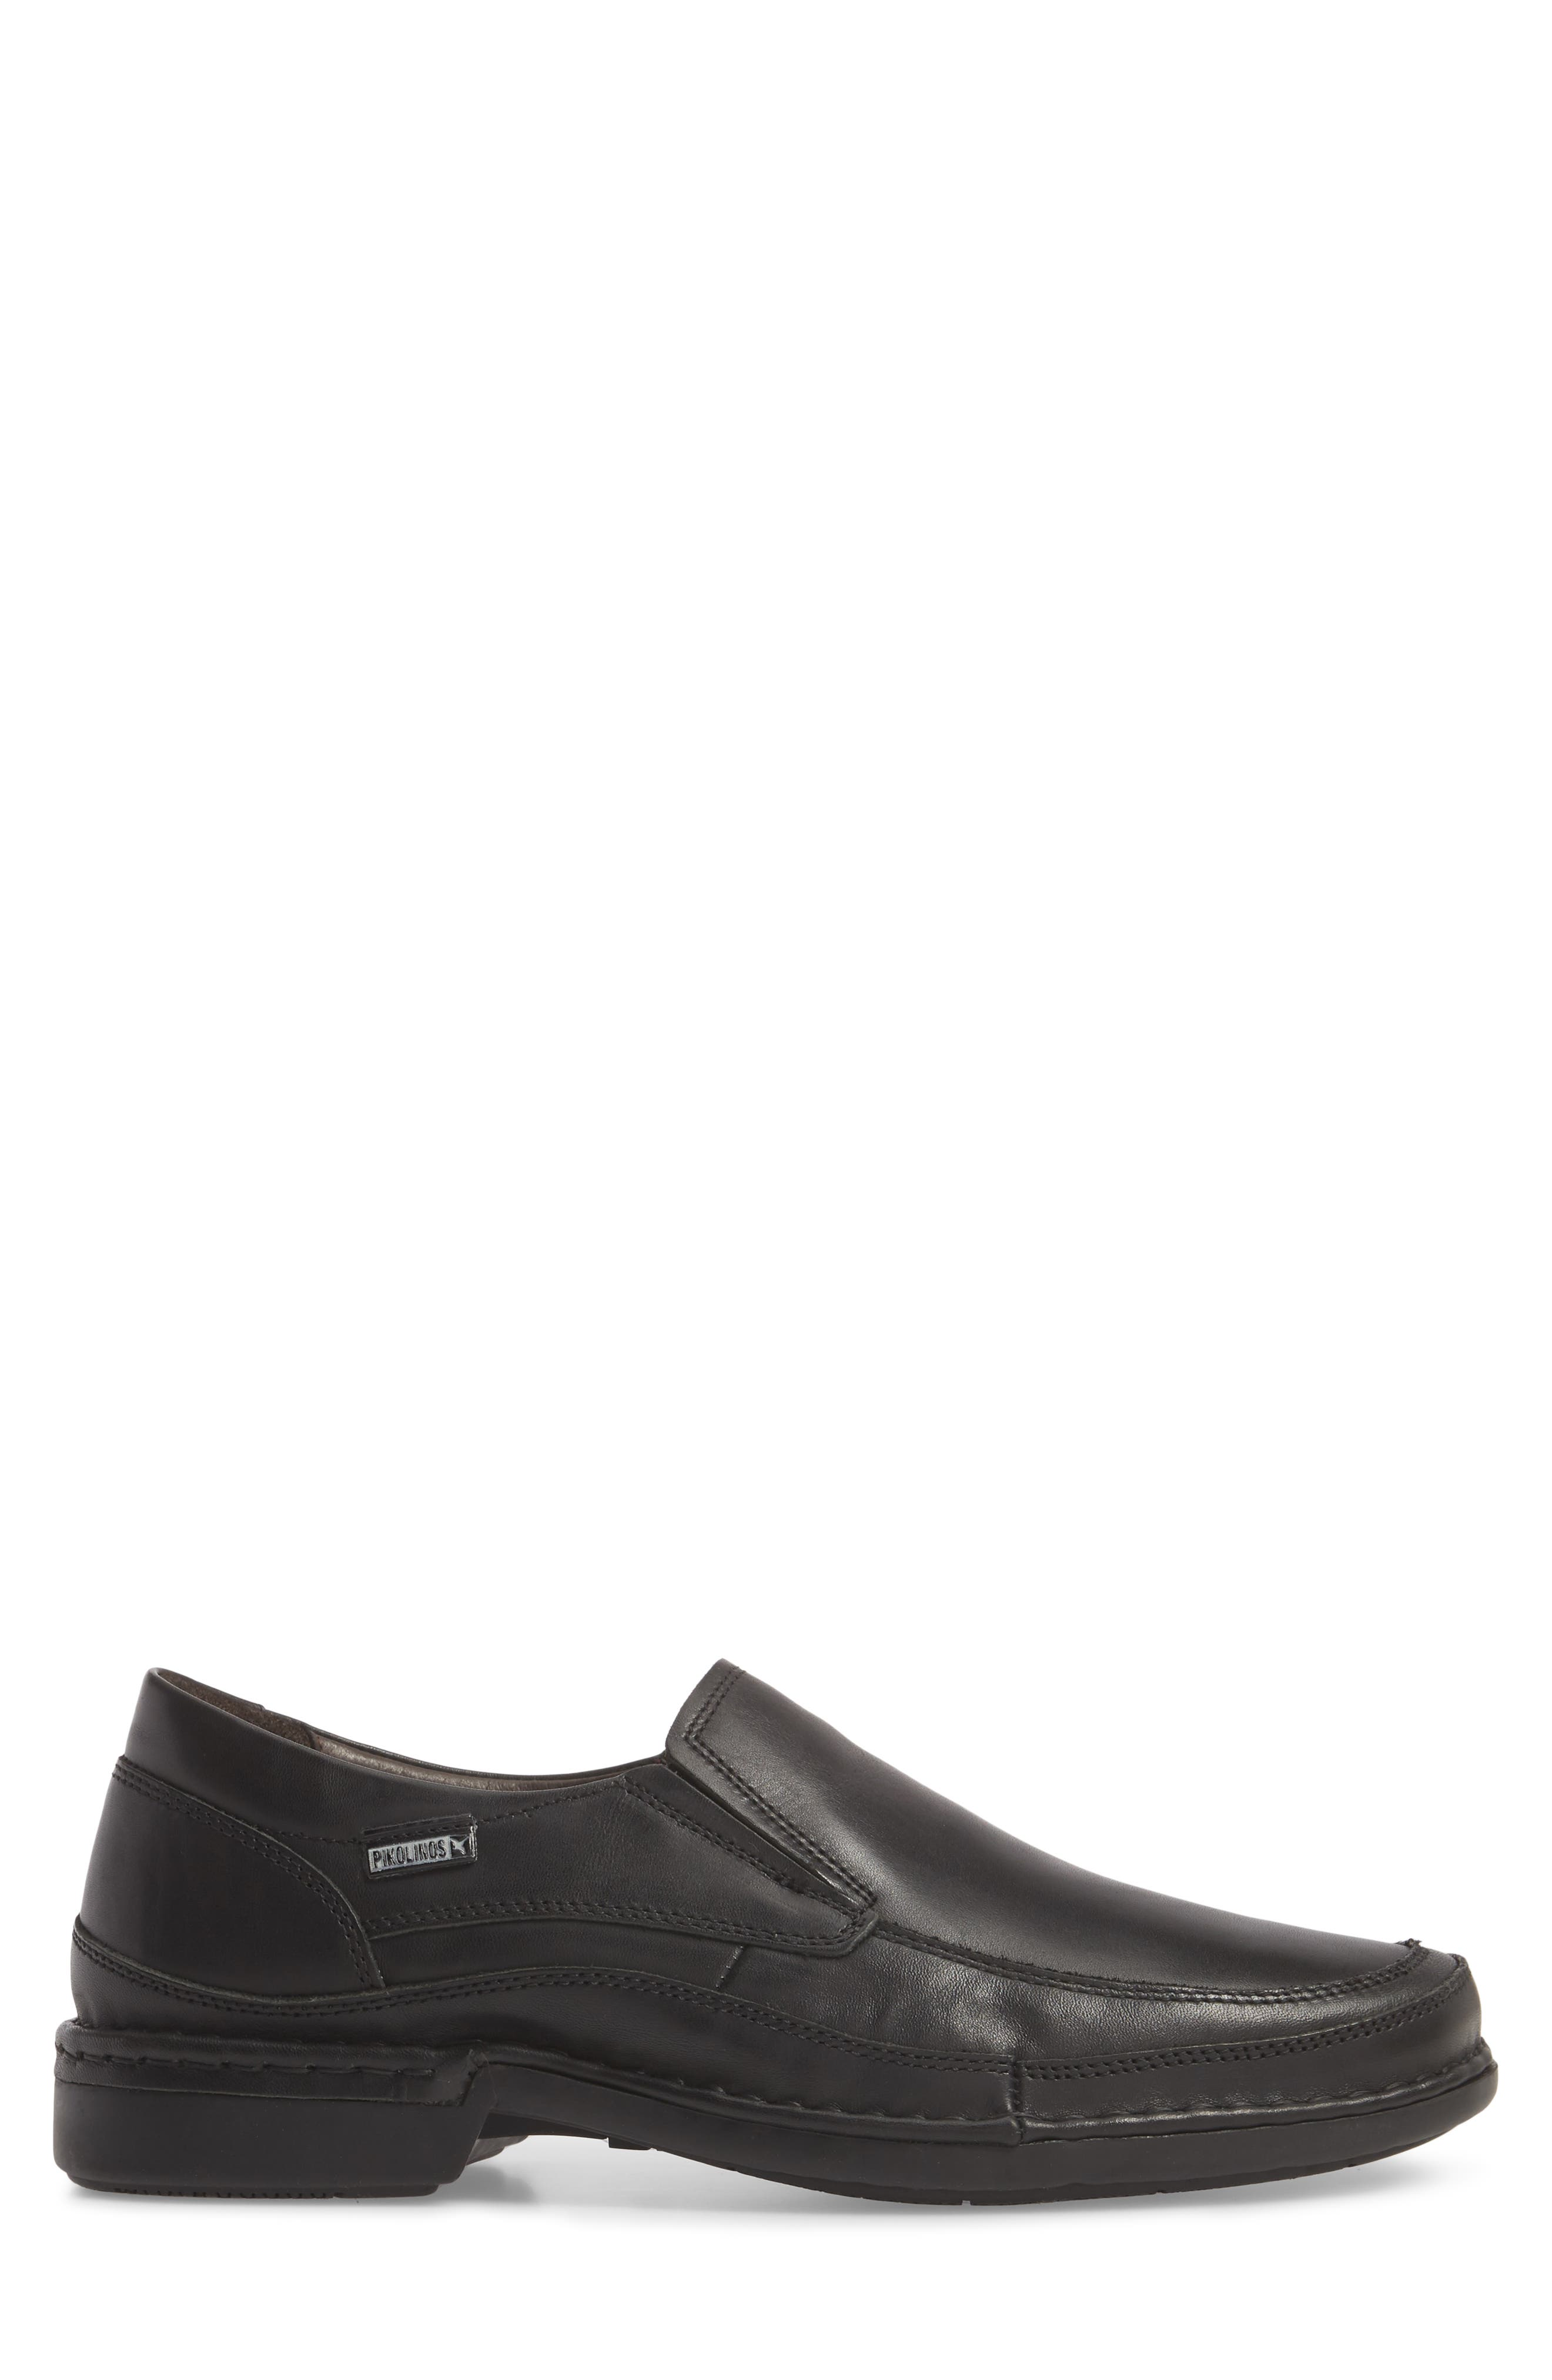 'Oviedo' Slip-On,                             Alternate thumbnail 3, color,                             Black Leather